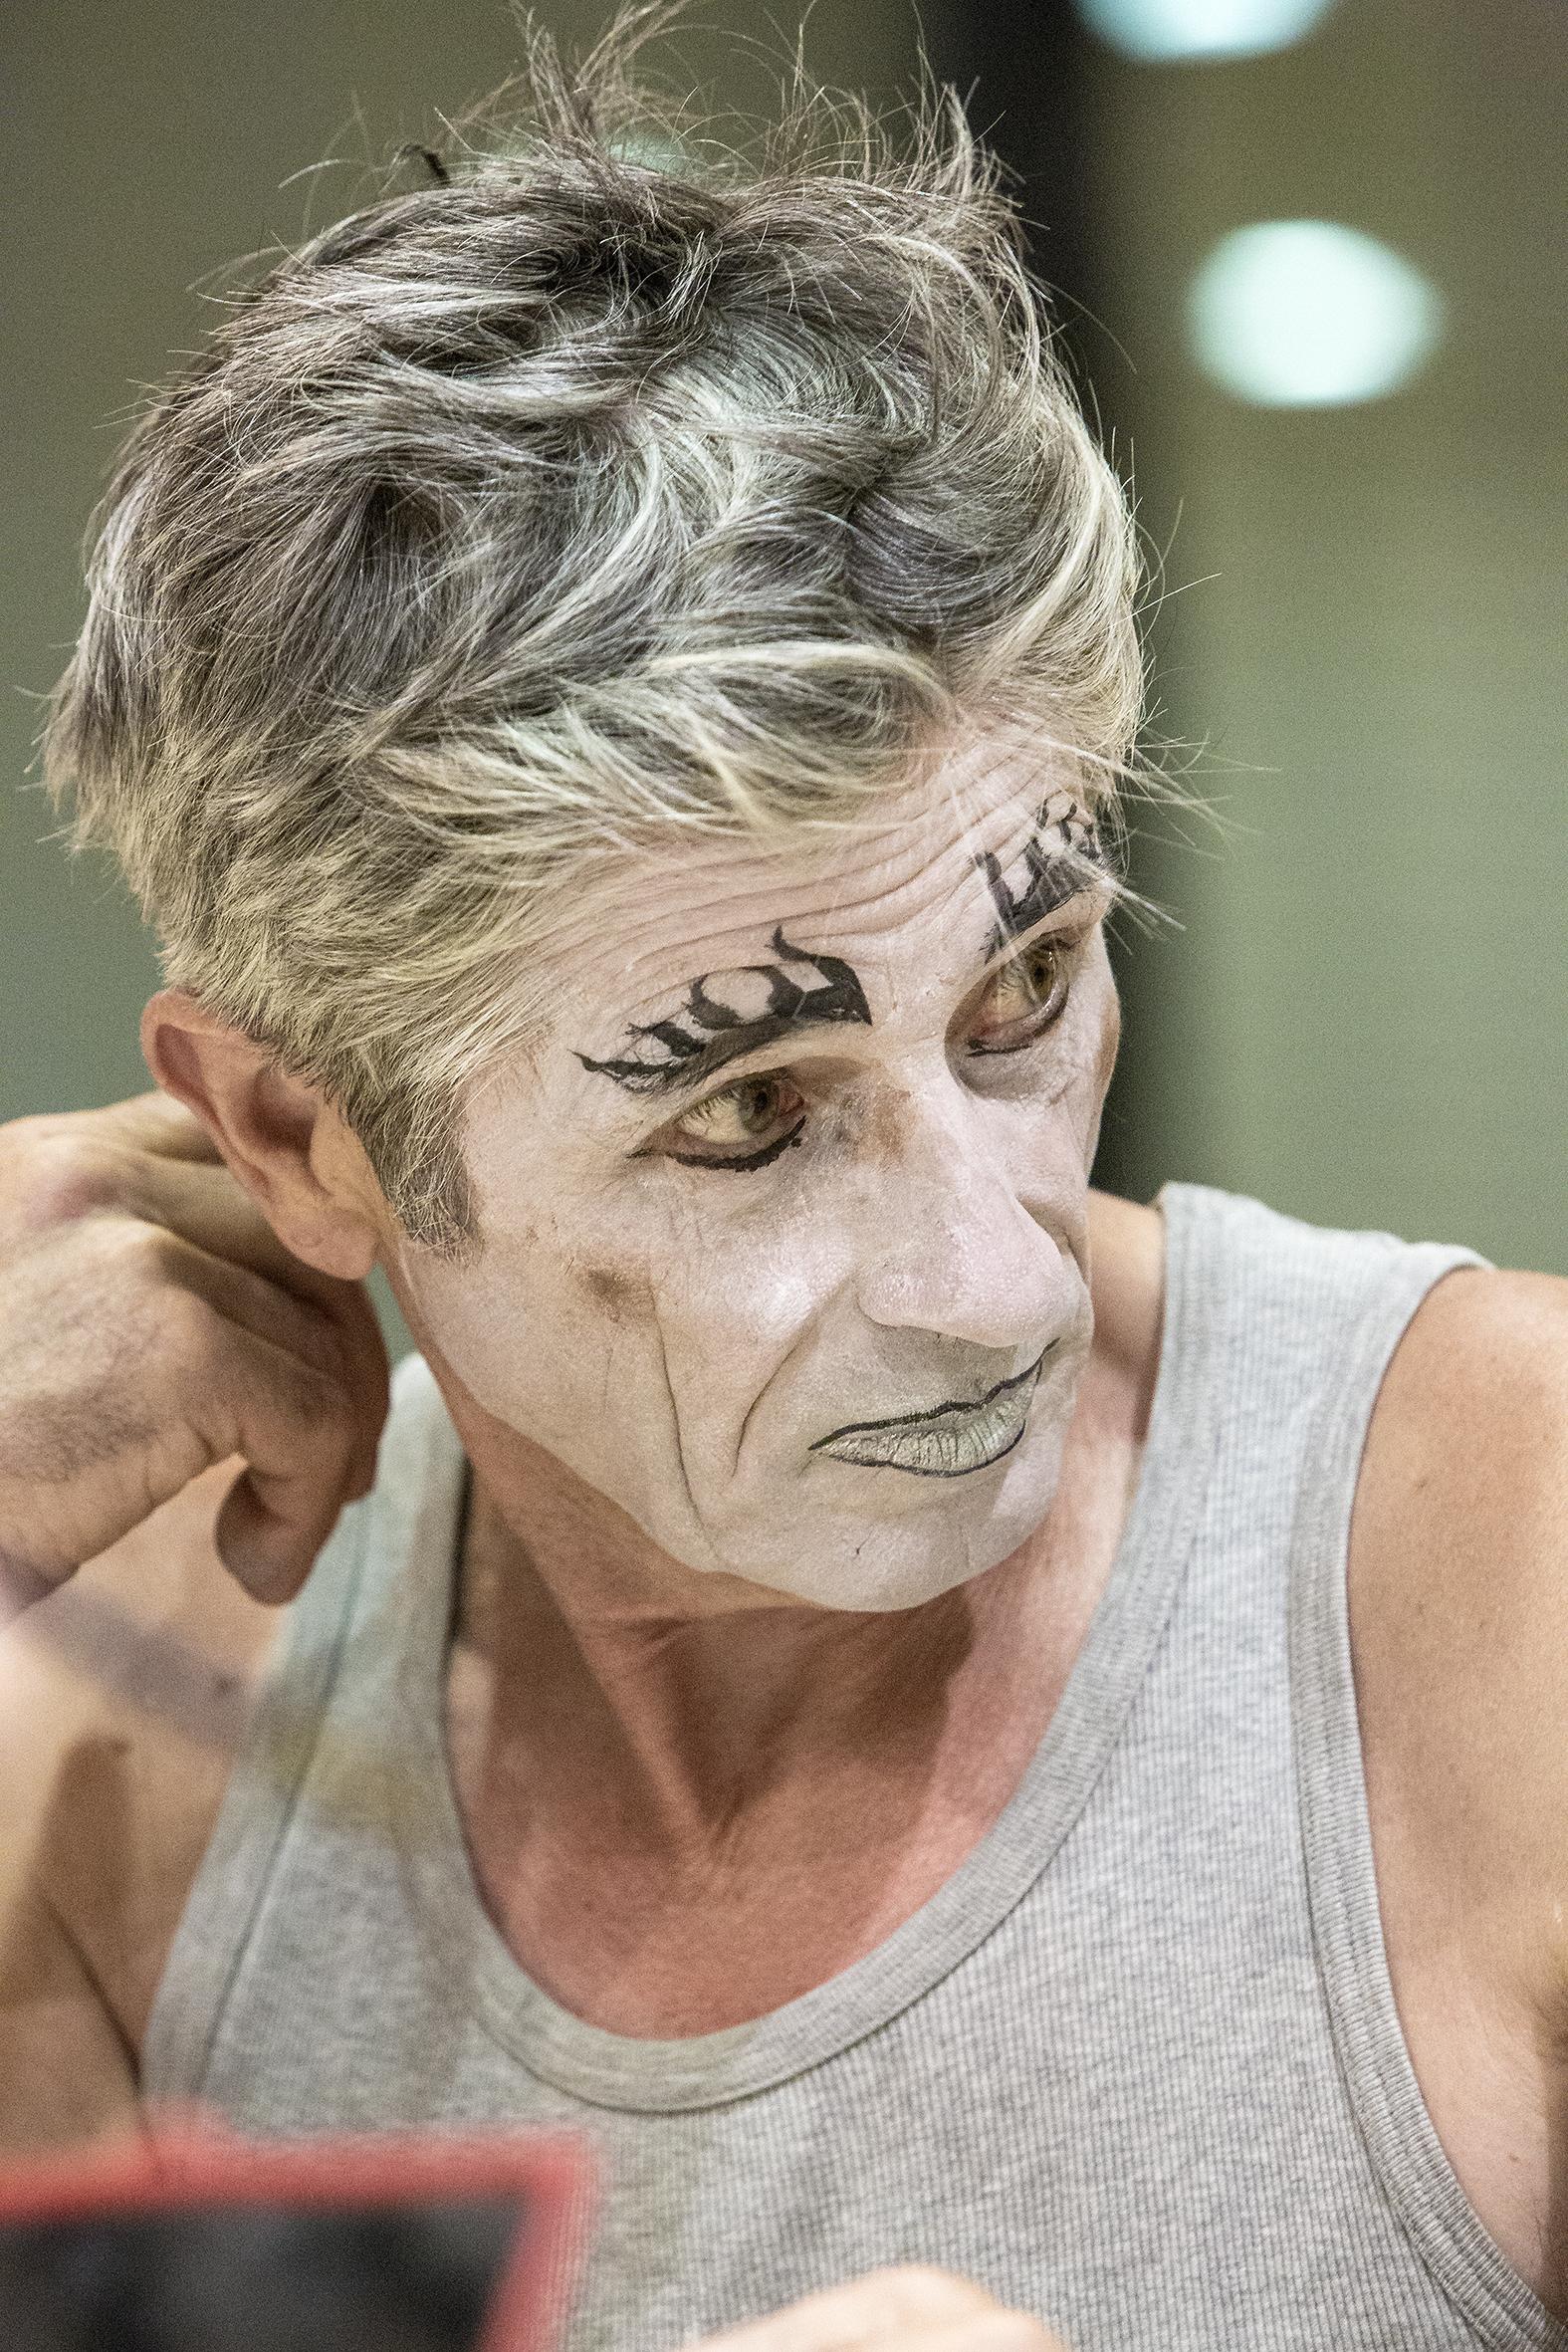 festival-la-sarre-a-contes-maudits-sonnants-sarralbe-2015-08-marie-colette-becker-006